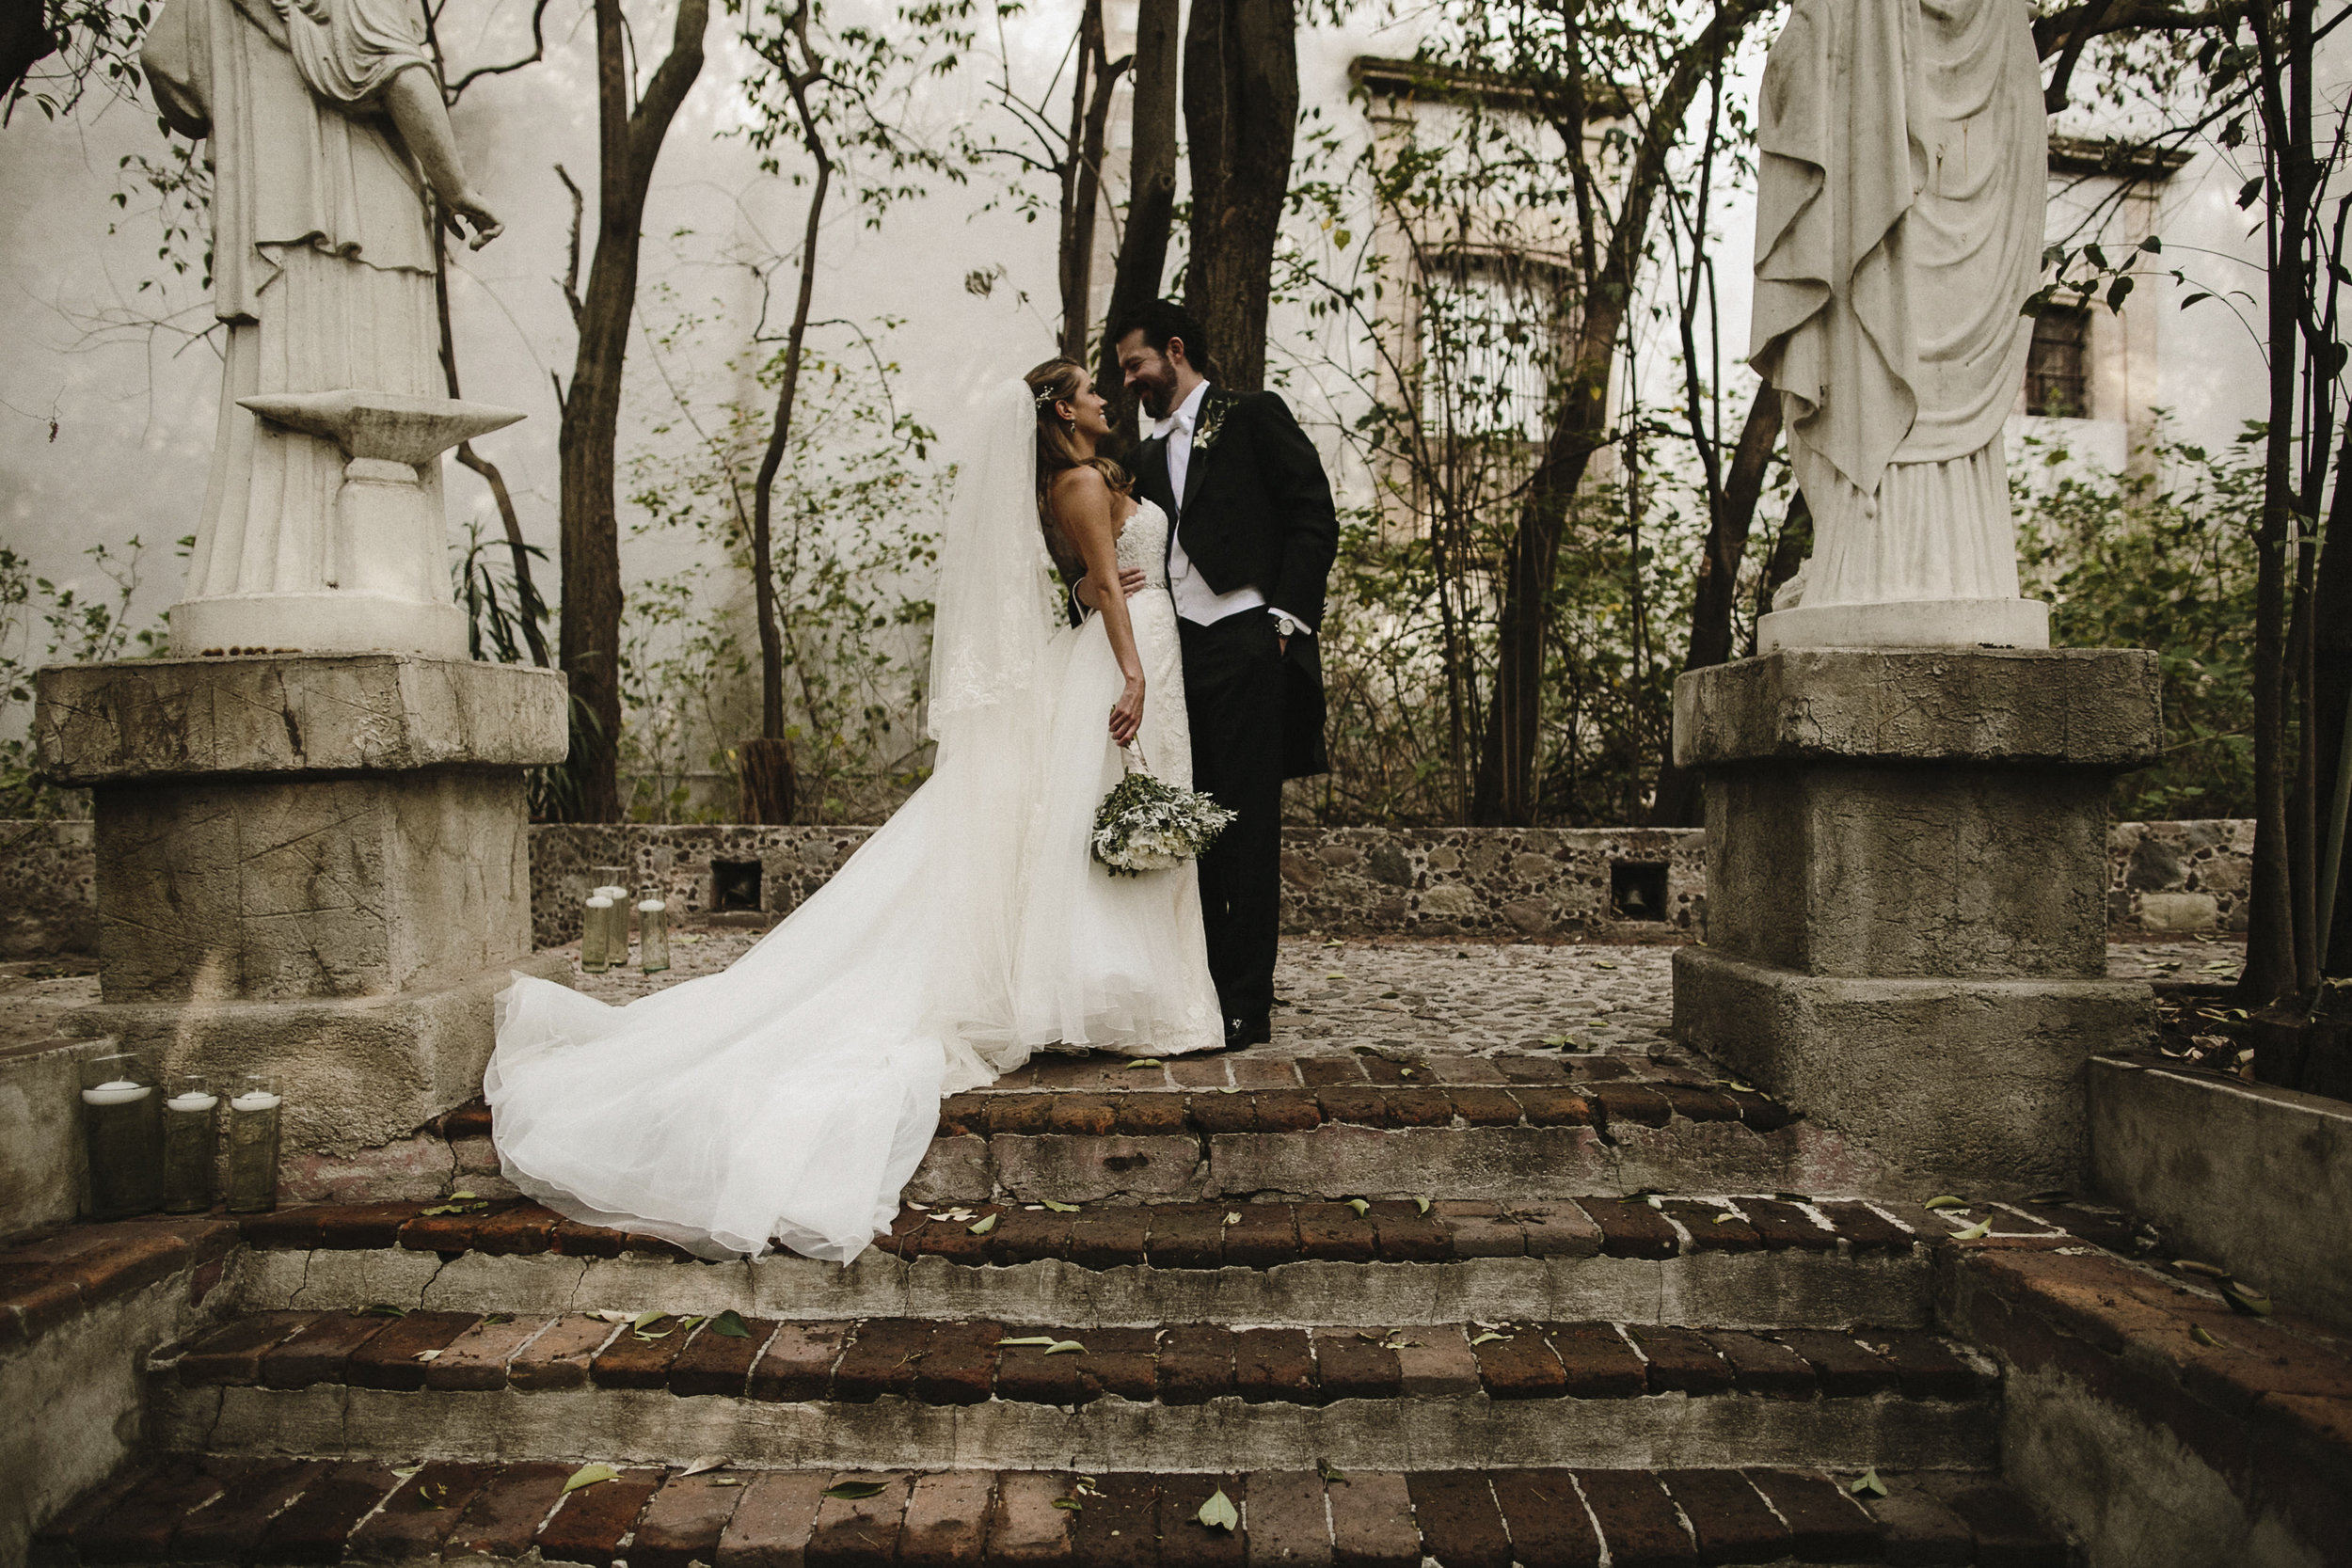 alfonso_flores_destination_wedding_photogrpahy_paola_alonso-256.JPG